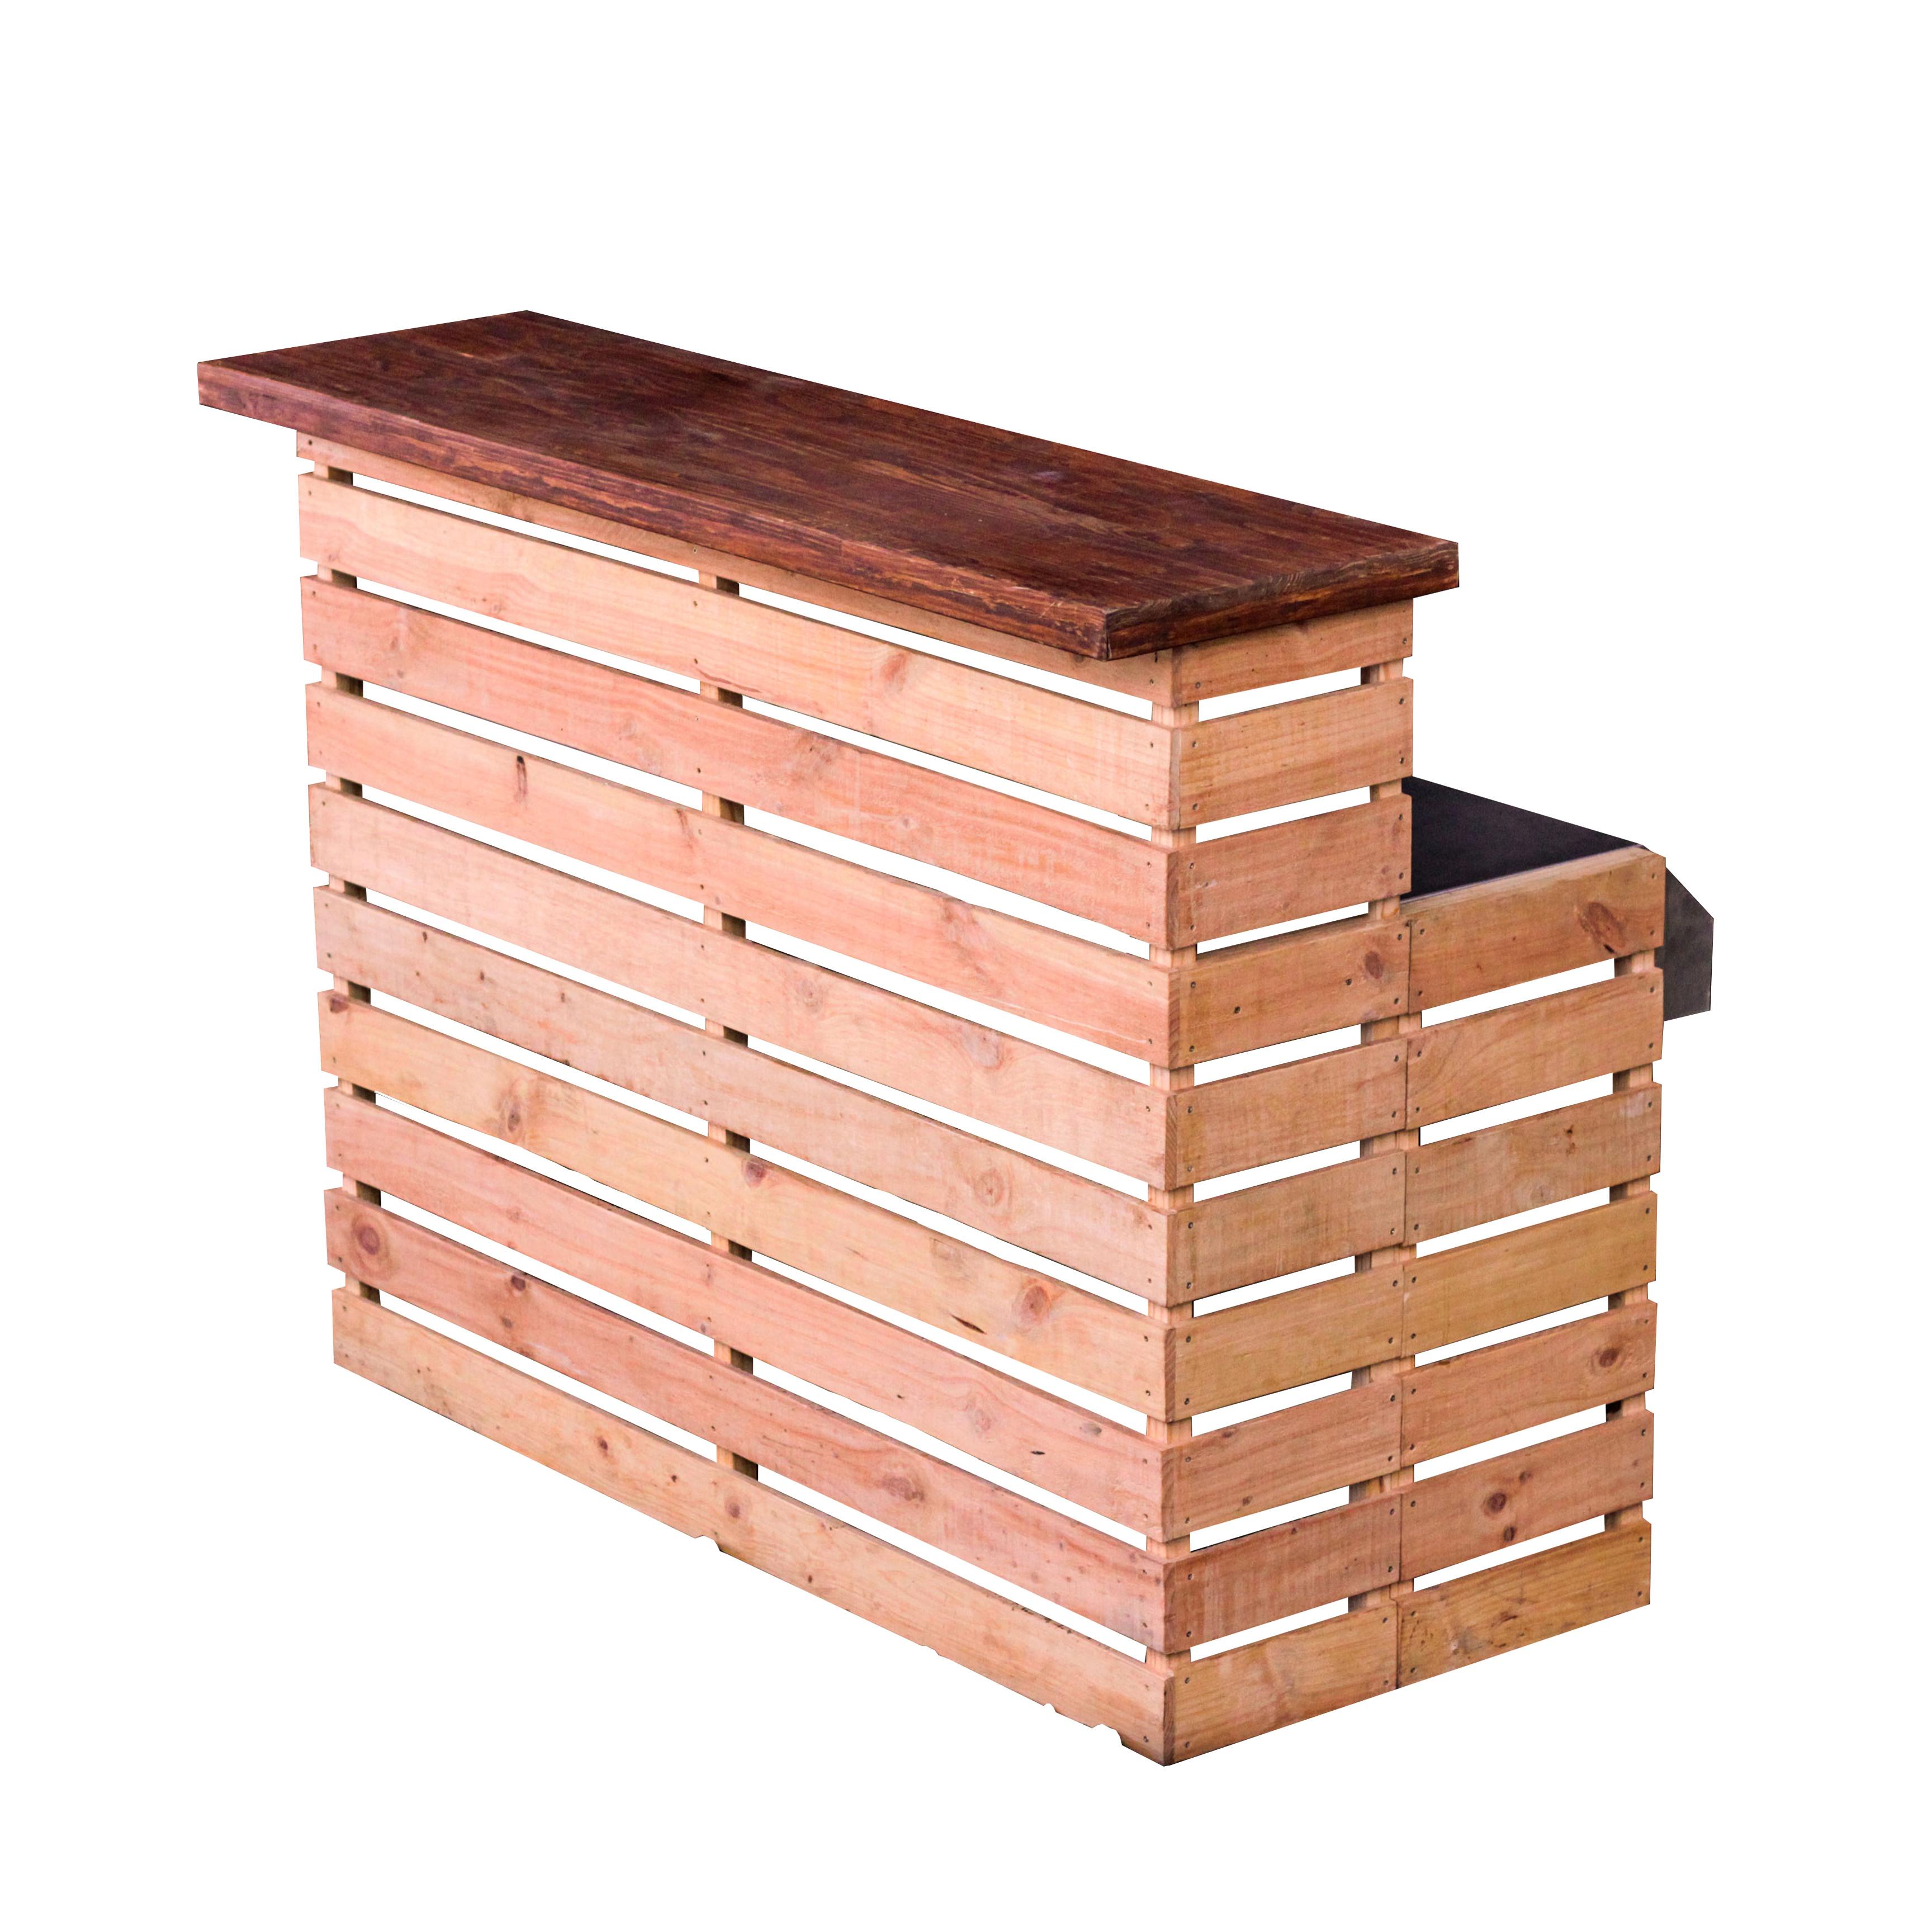 Natural Wooden Pallet Bar For Hire